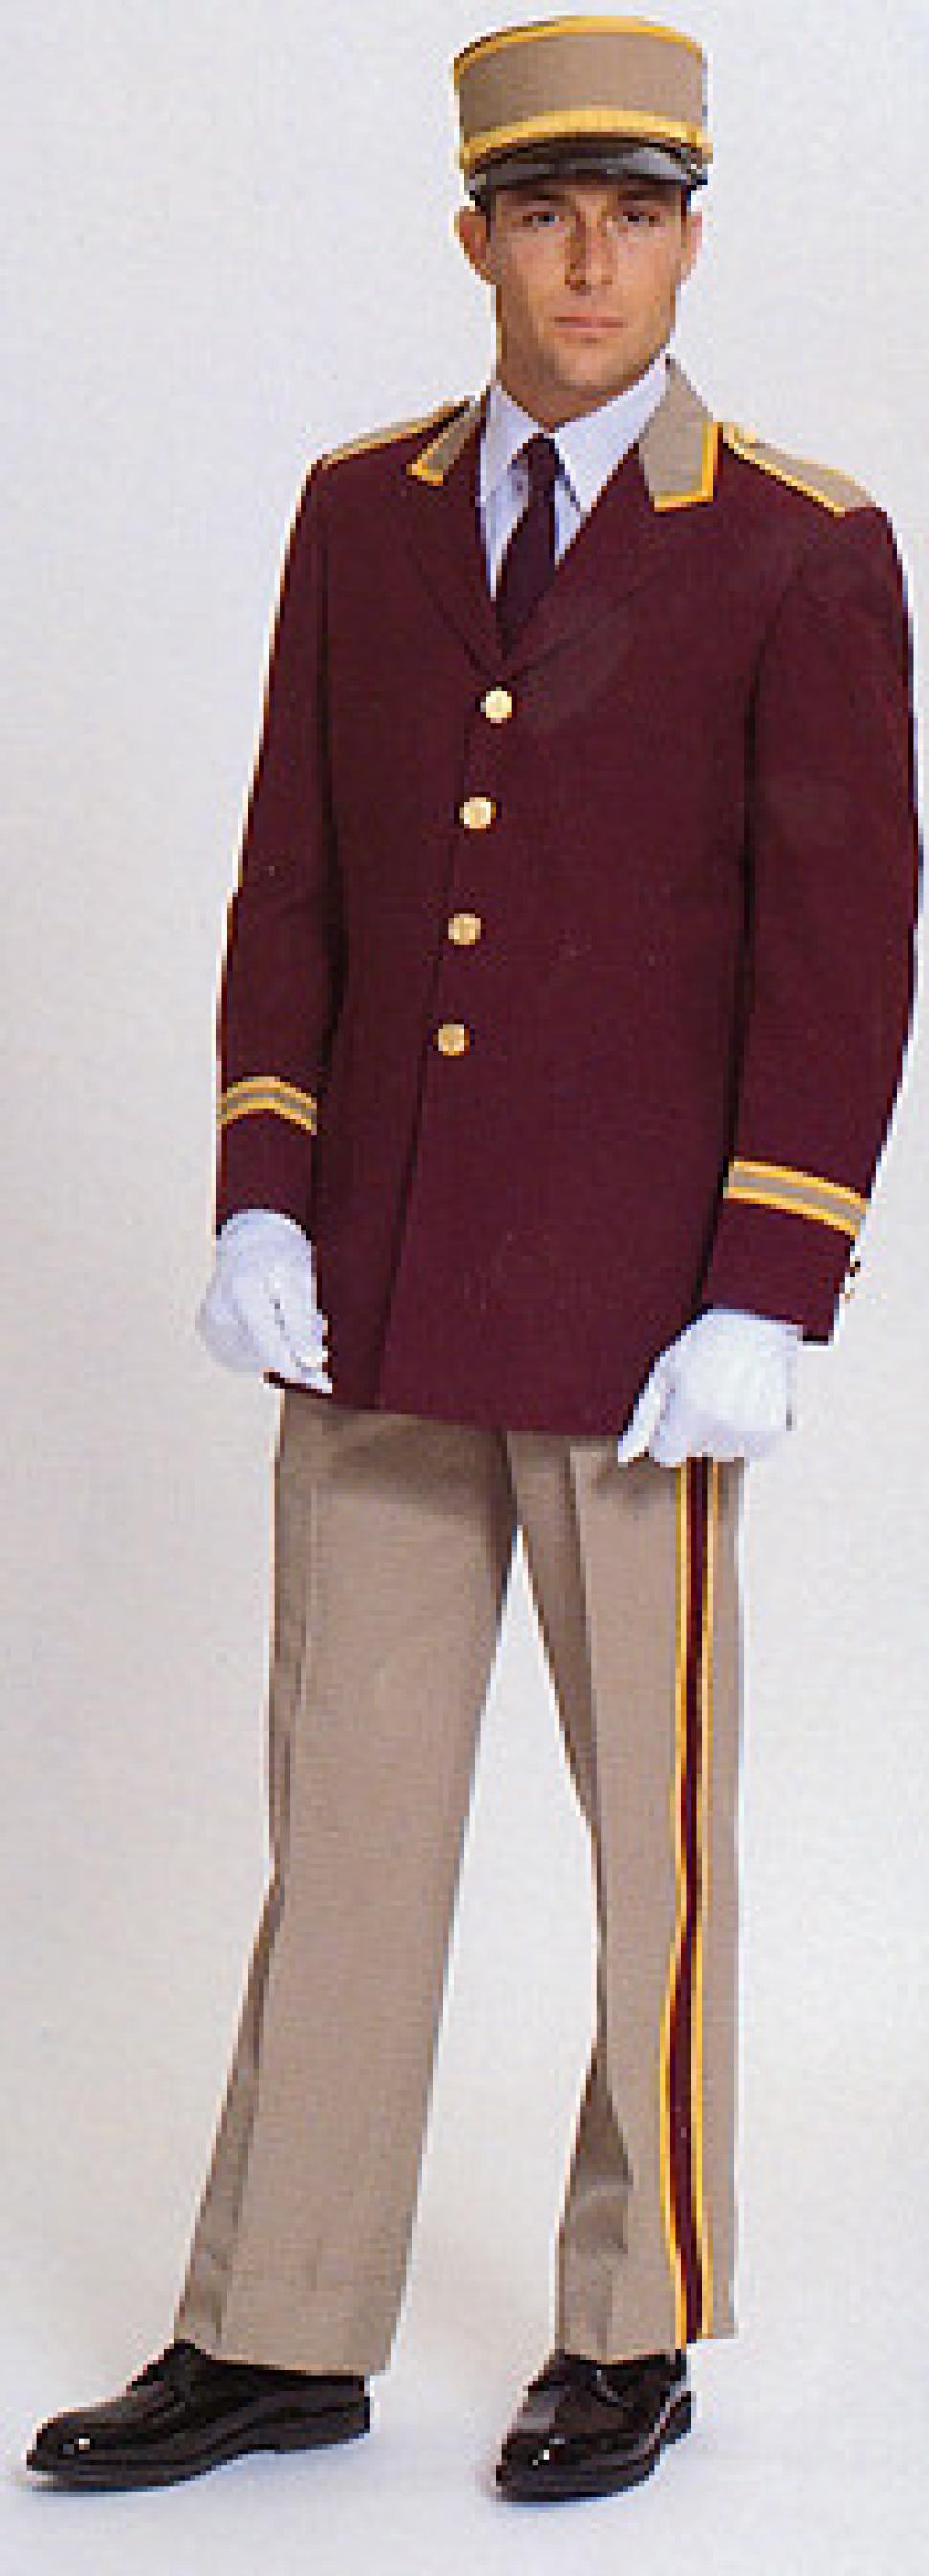 1950 39 s door men google search henry pinterest for Spa uniform europe